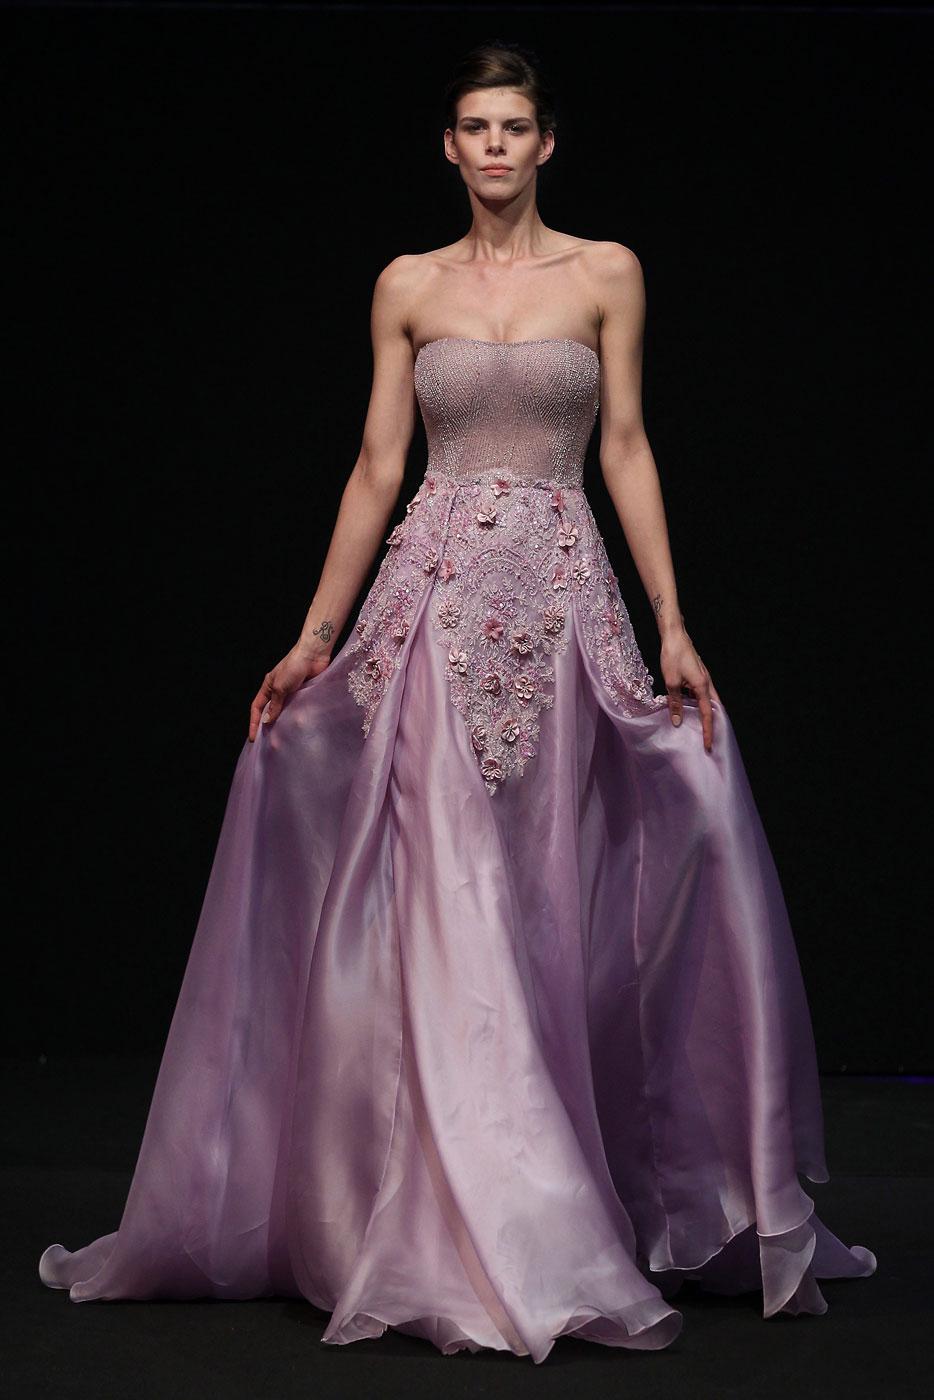 Abed-Mahfouz-fashion-runway-show-haute-couture-paris-spring-2015-the-impression-15